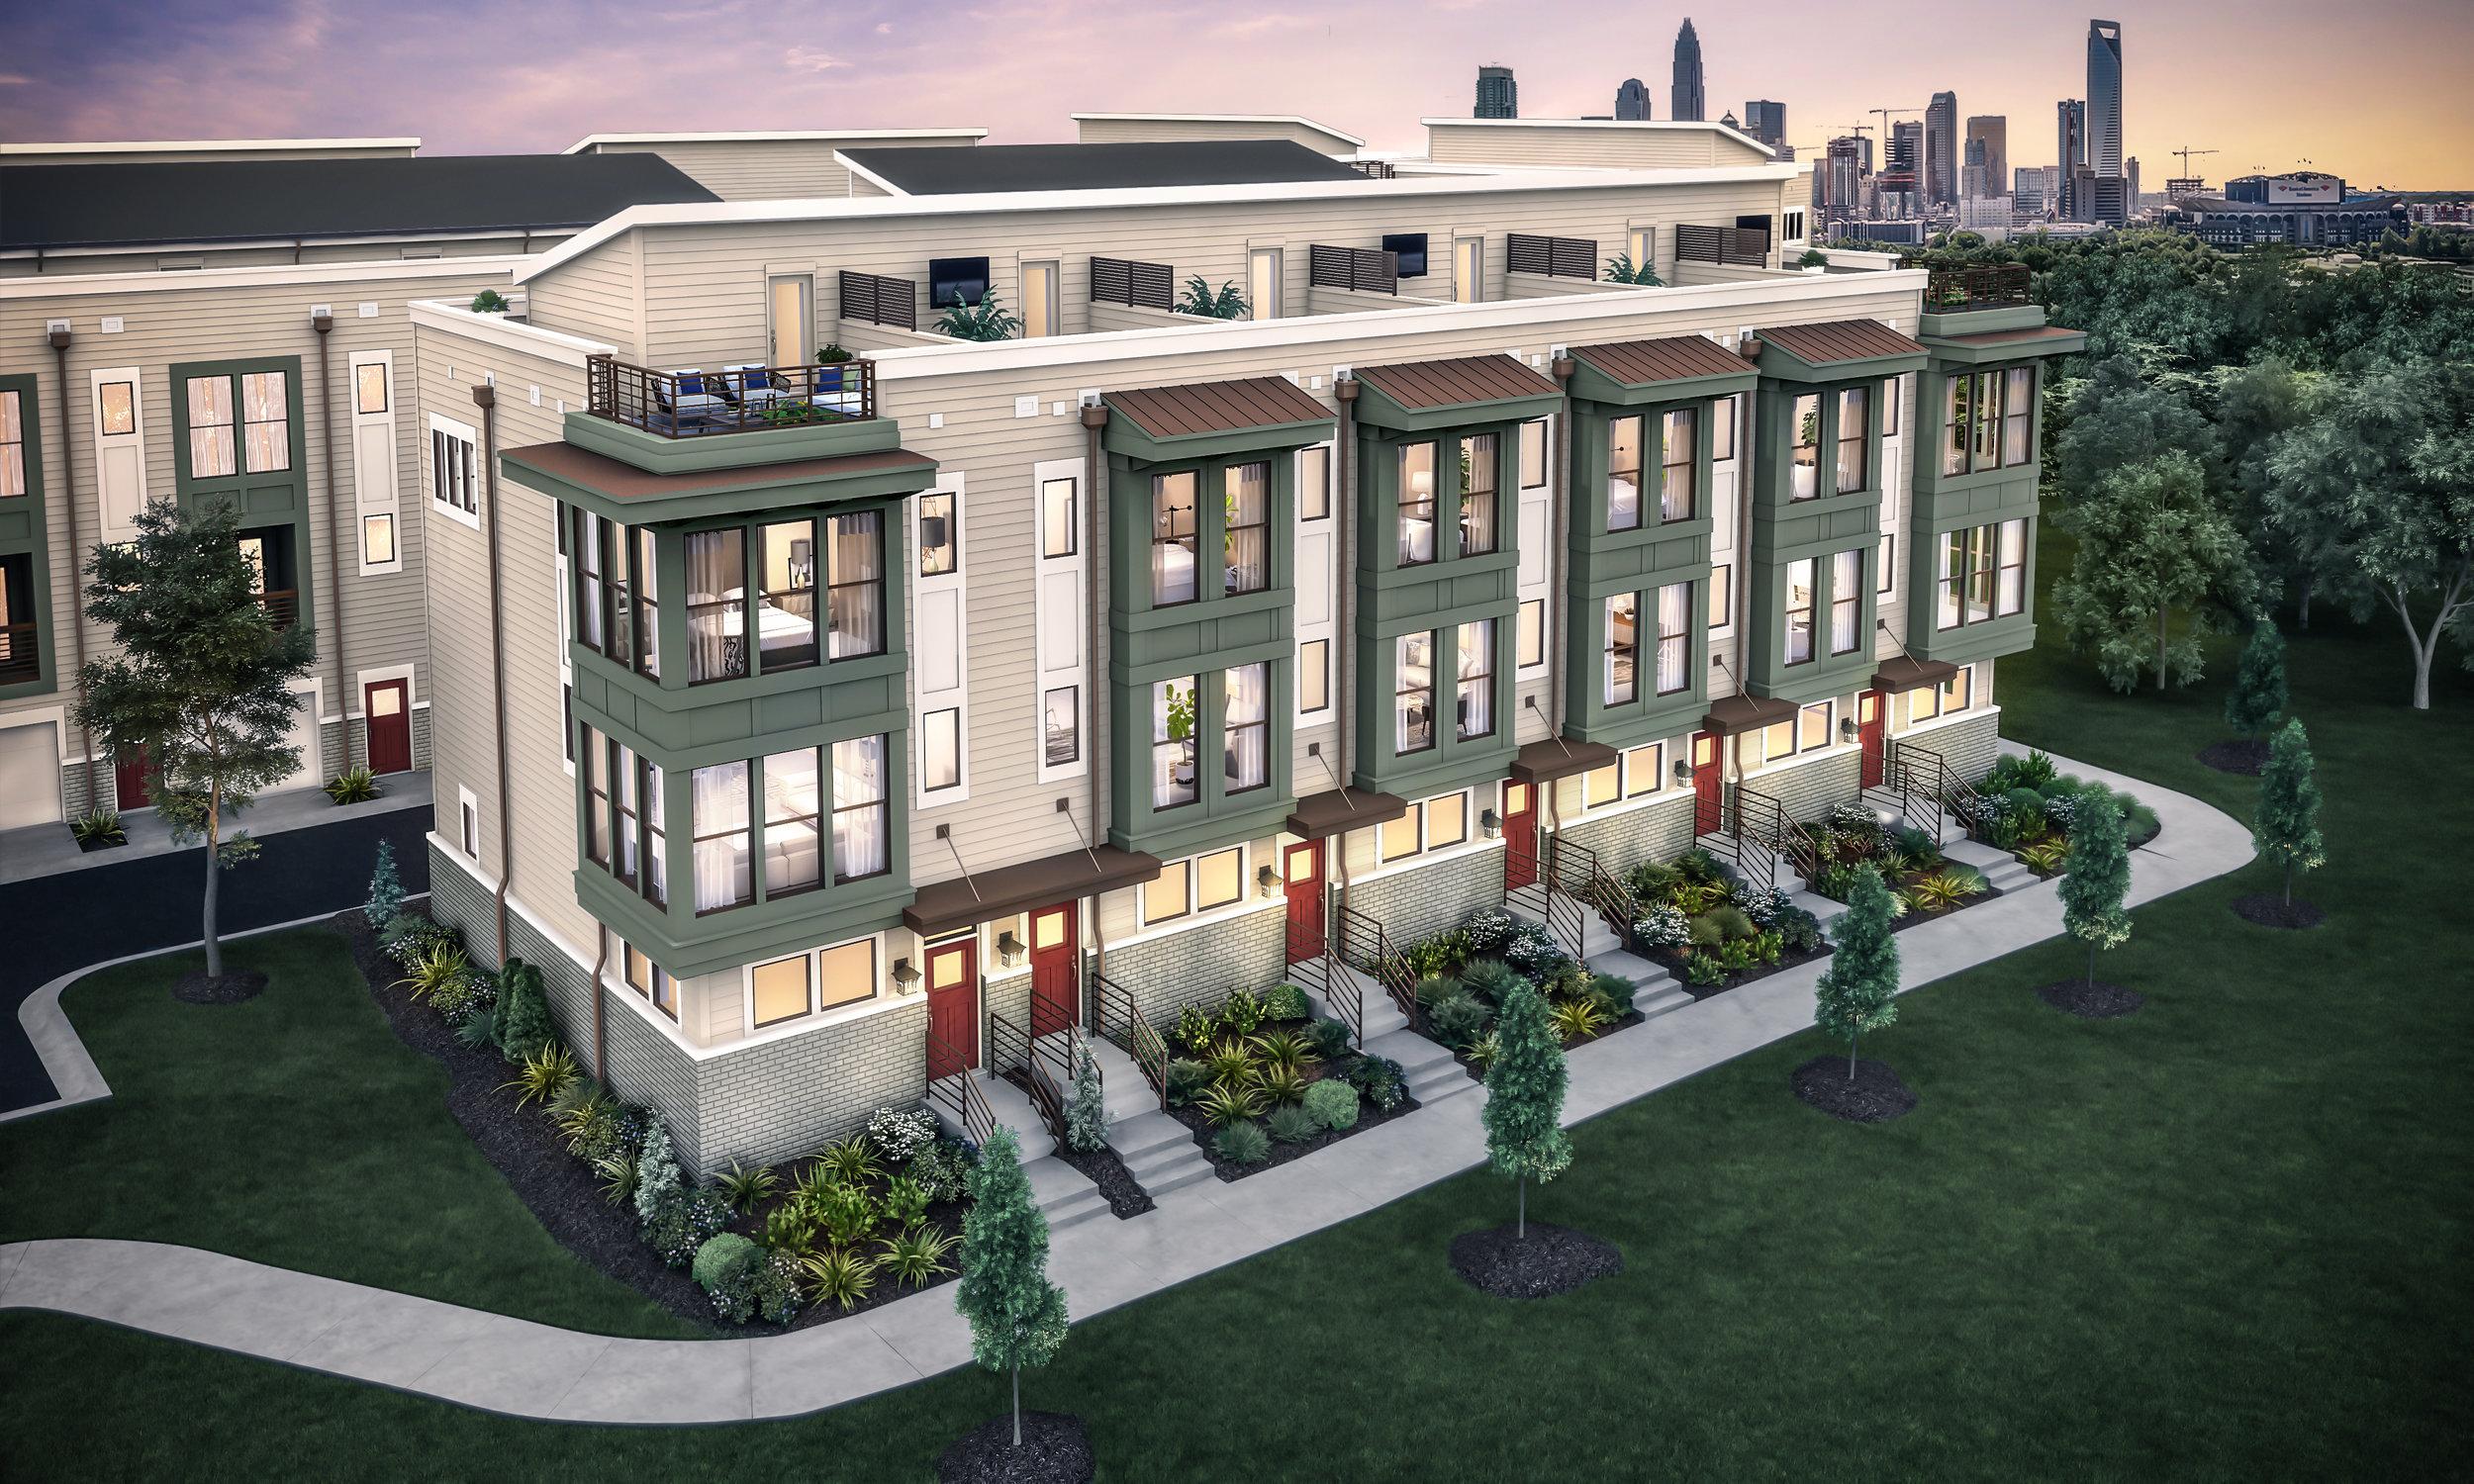 Uptown West - Building 15 Exterior Rendering - 03.26.18.jpg